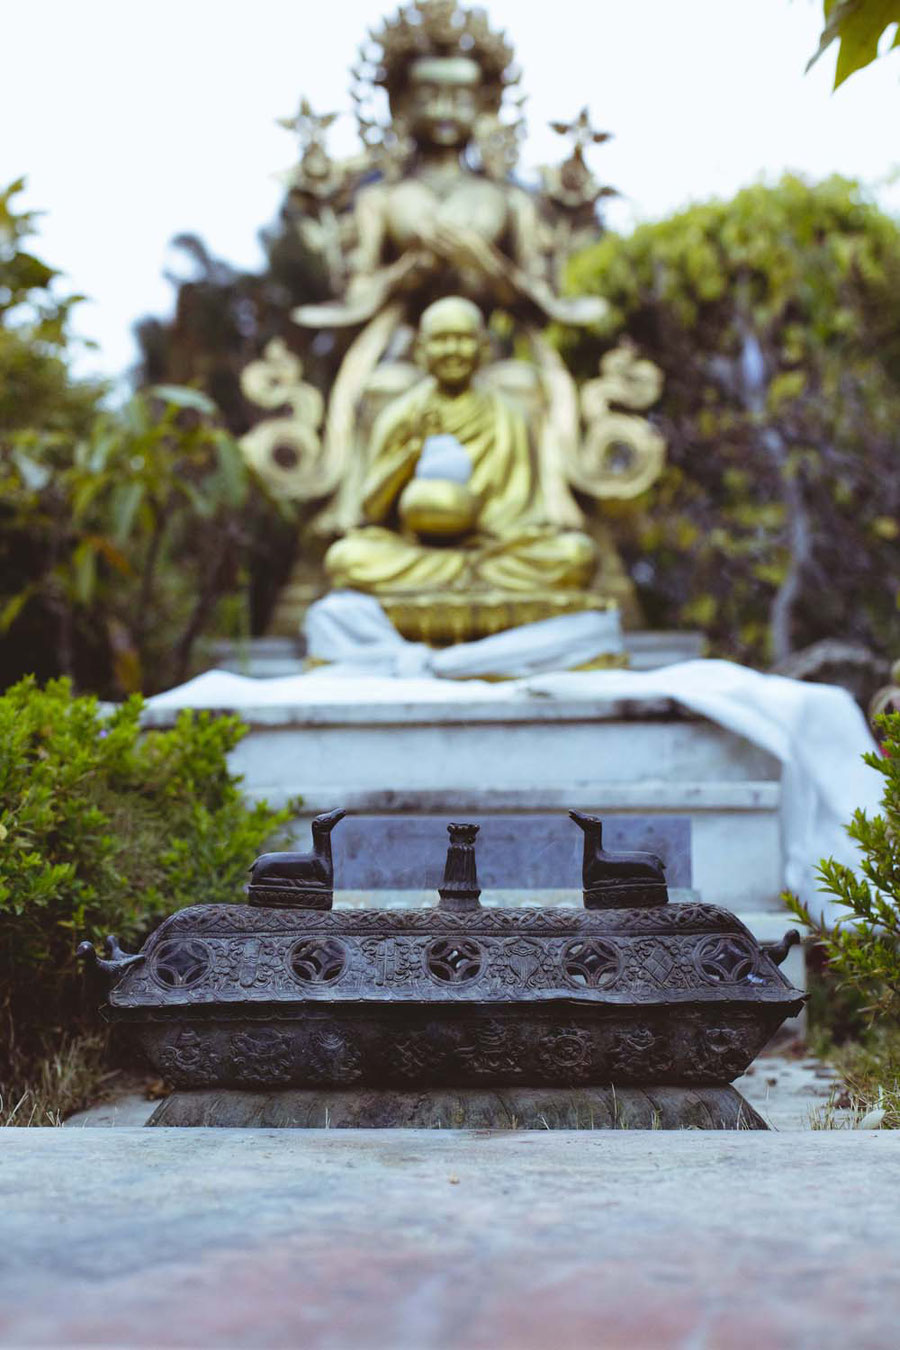 Stupa garden, Kopan Monaestery, Nepal